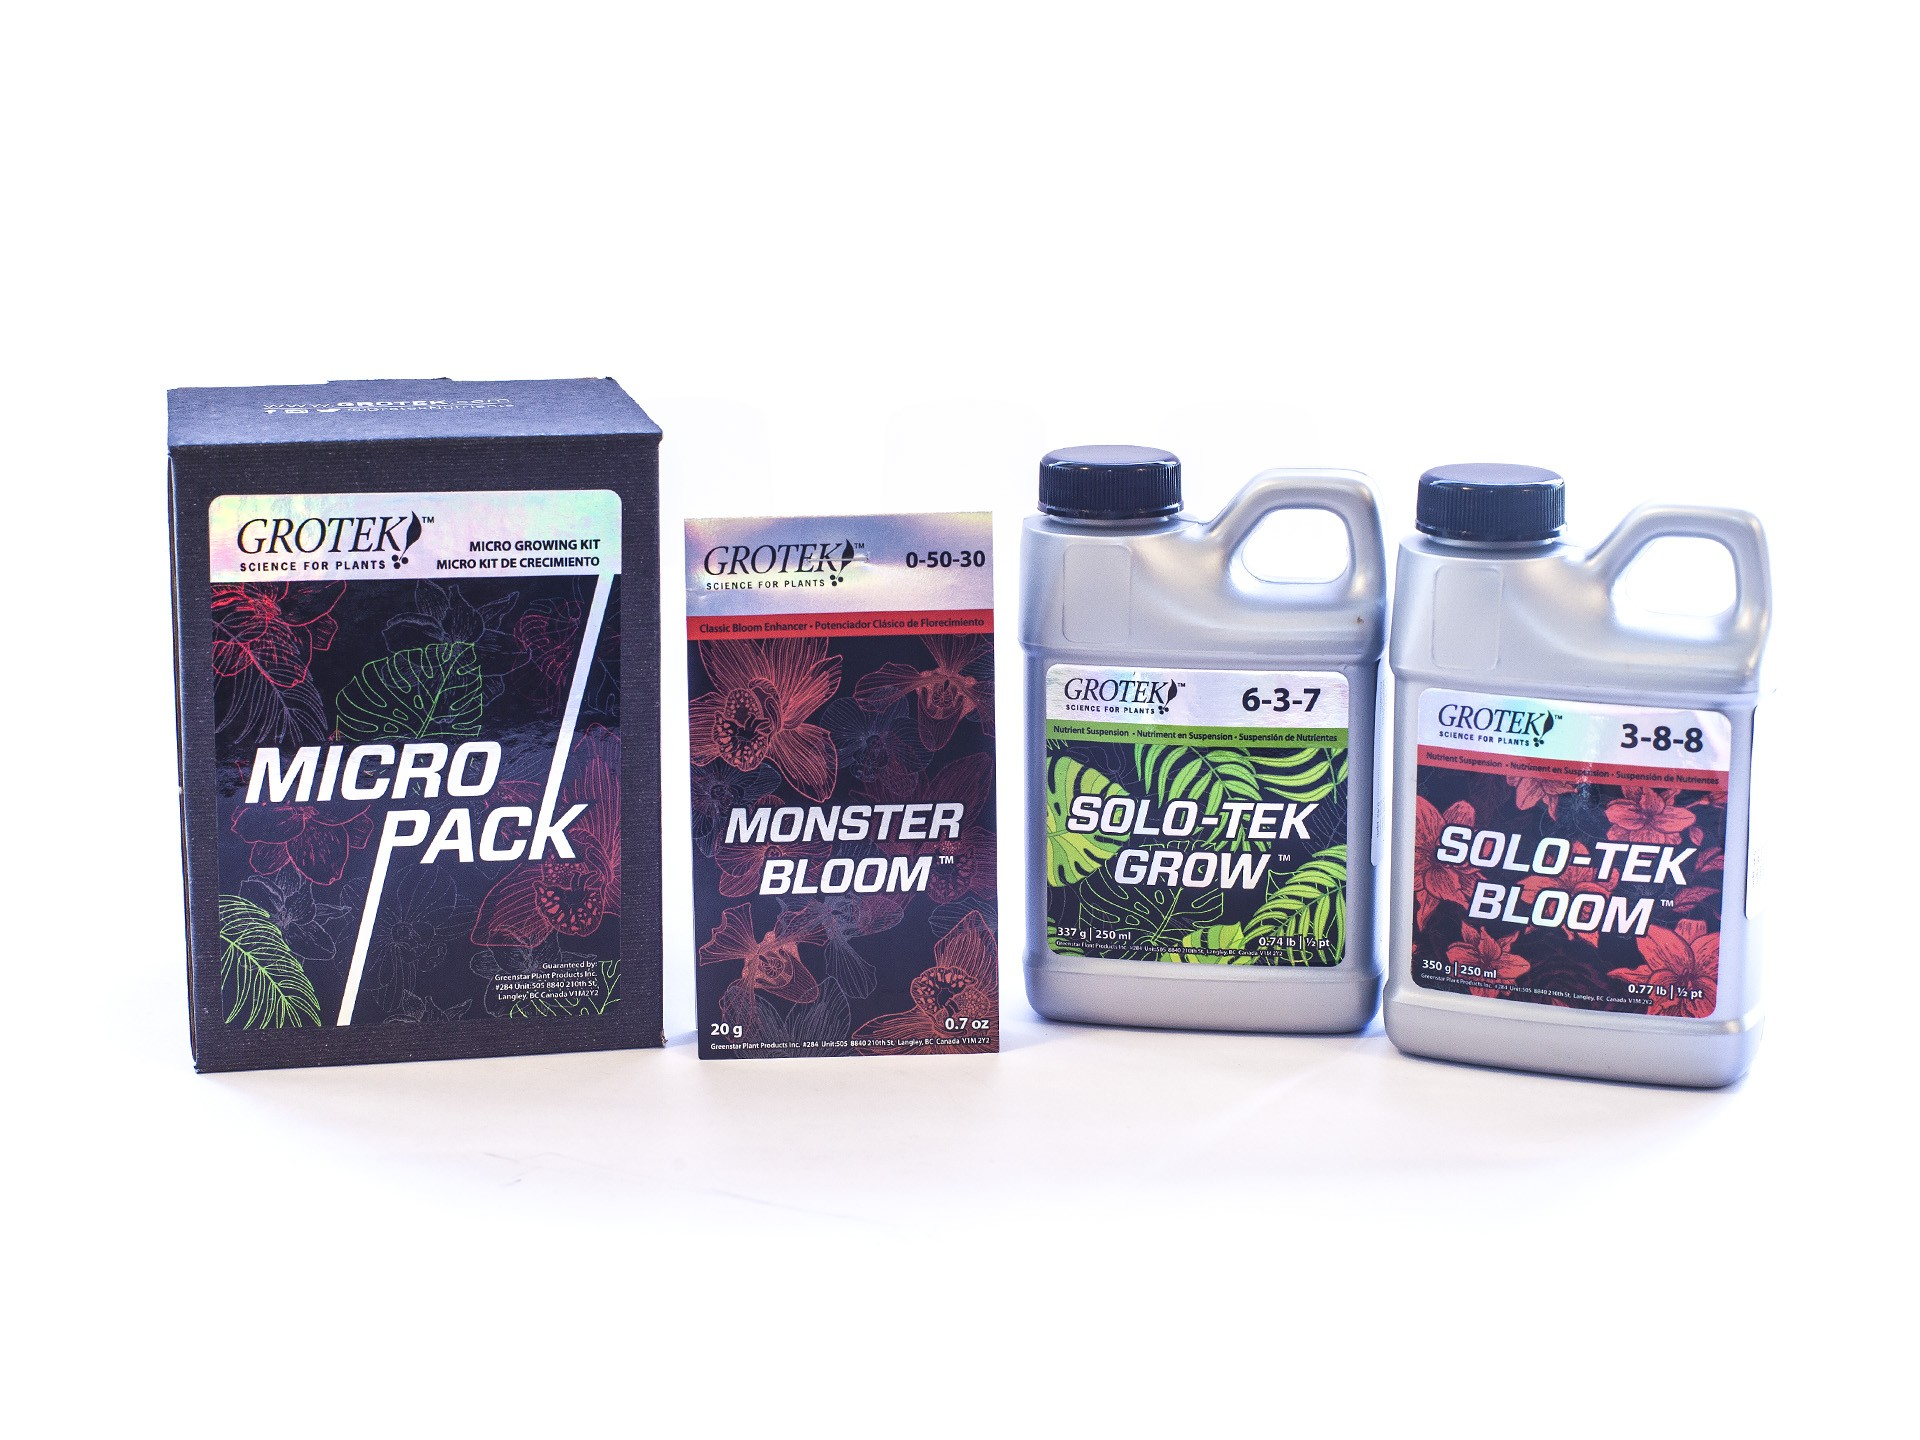 Micro Pack